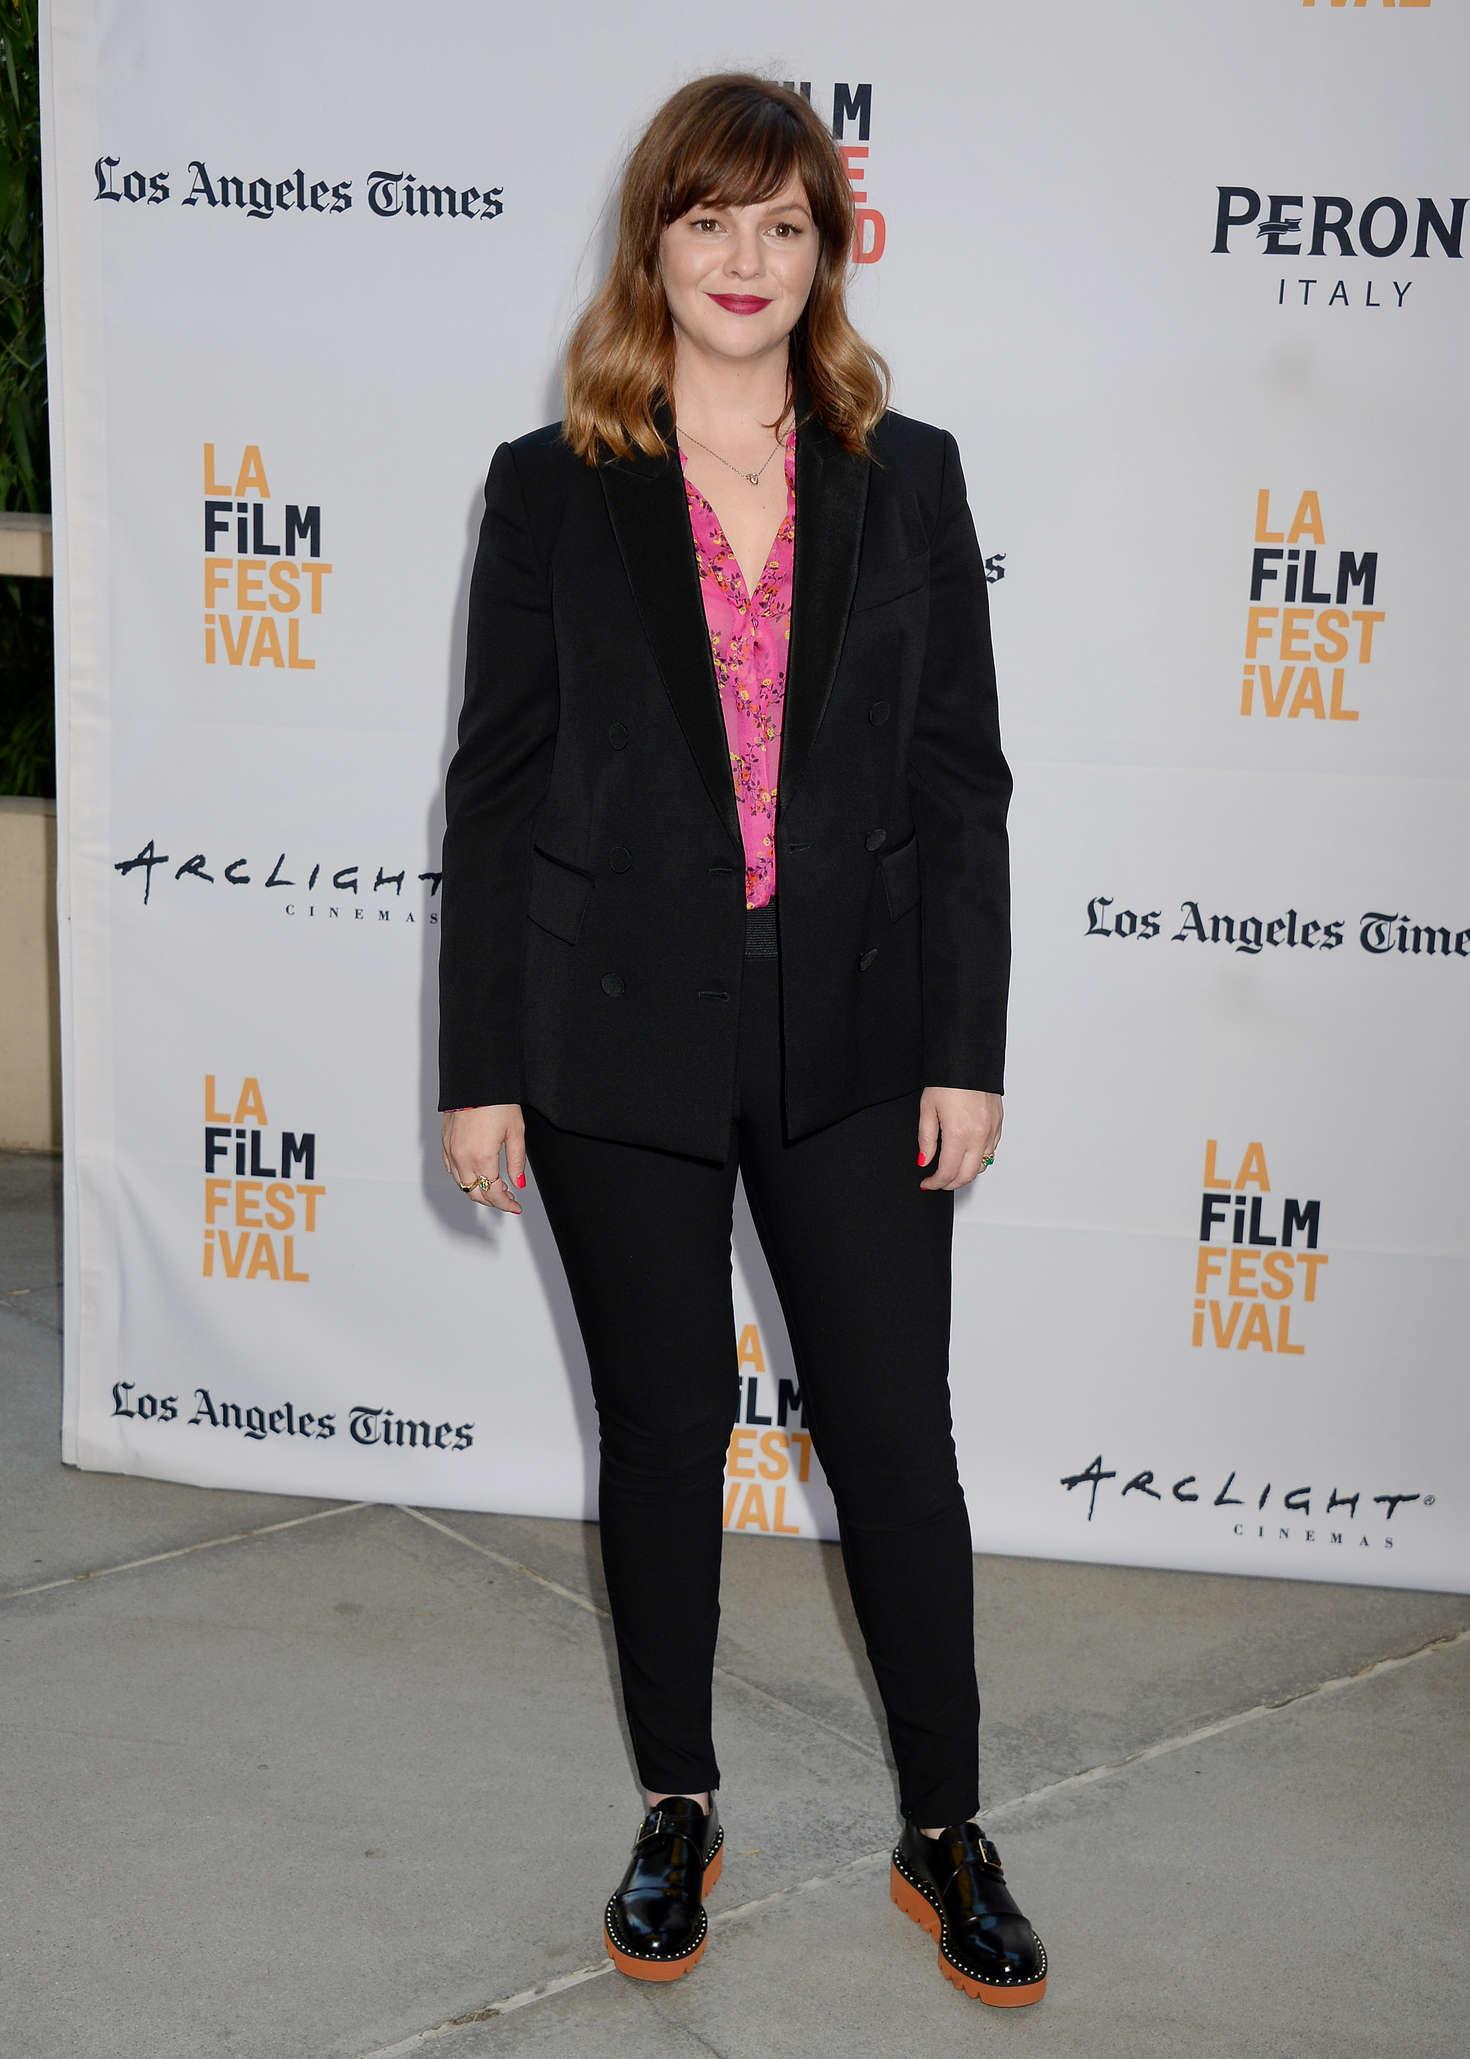 Amber Tamblyn - 'Paint It Black' Premiere at 2016 Los Angeles Film Festival in LA